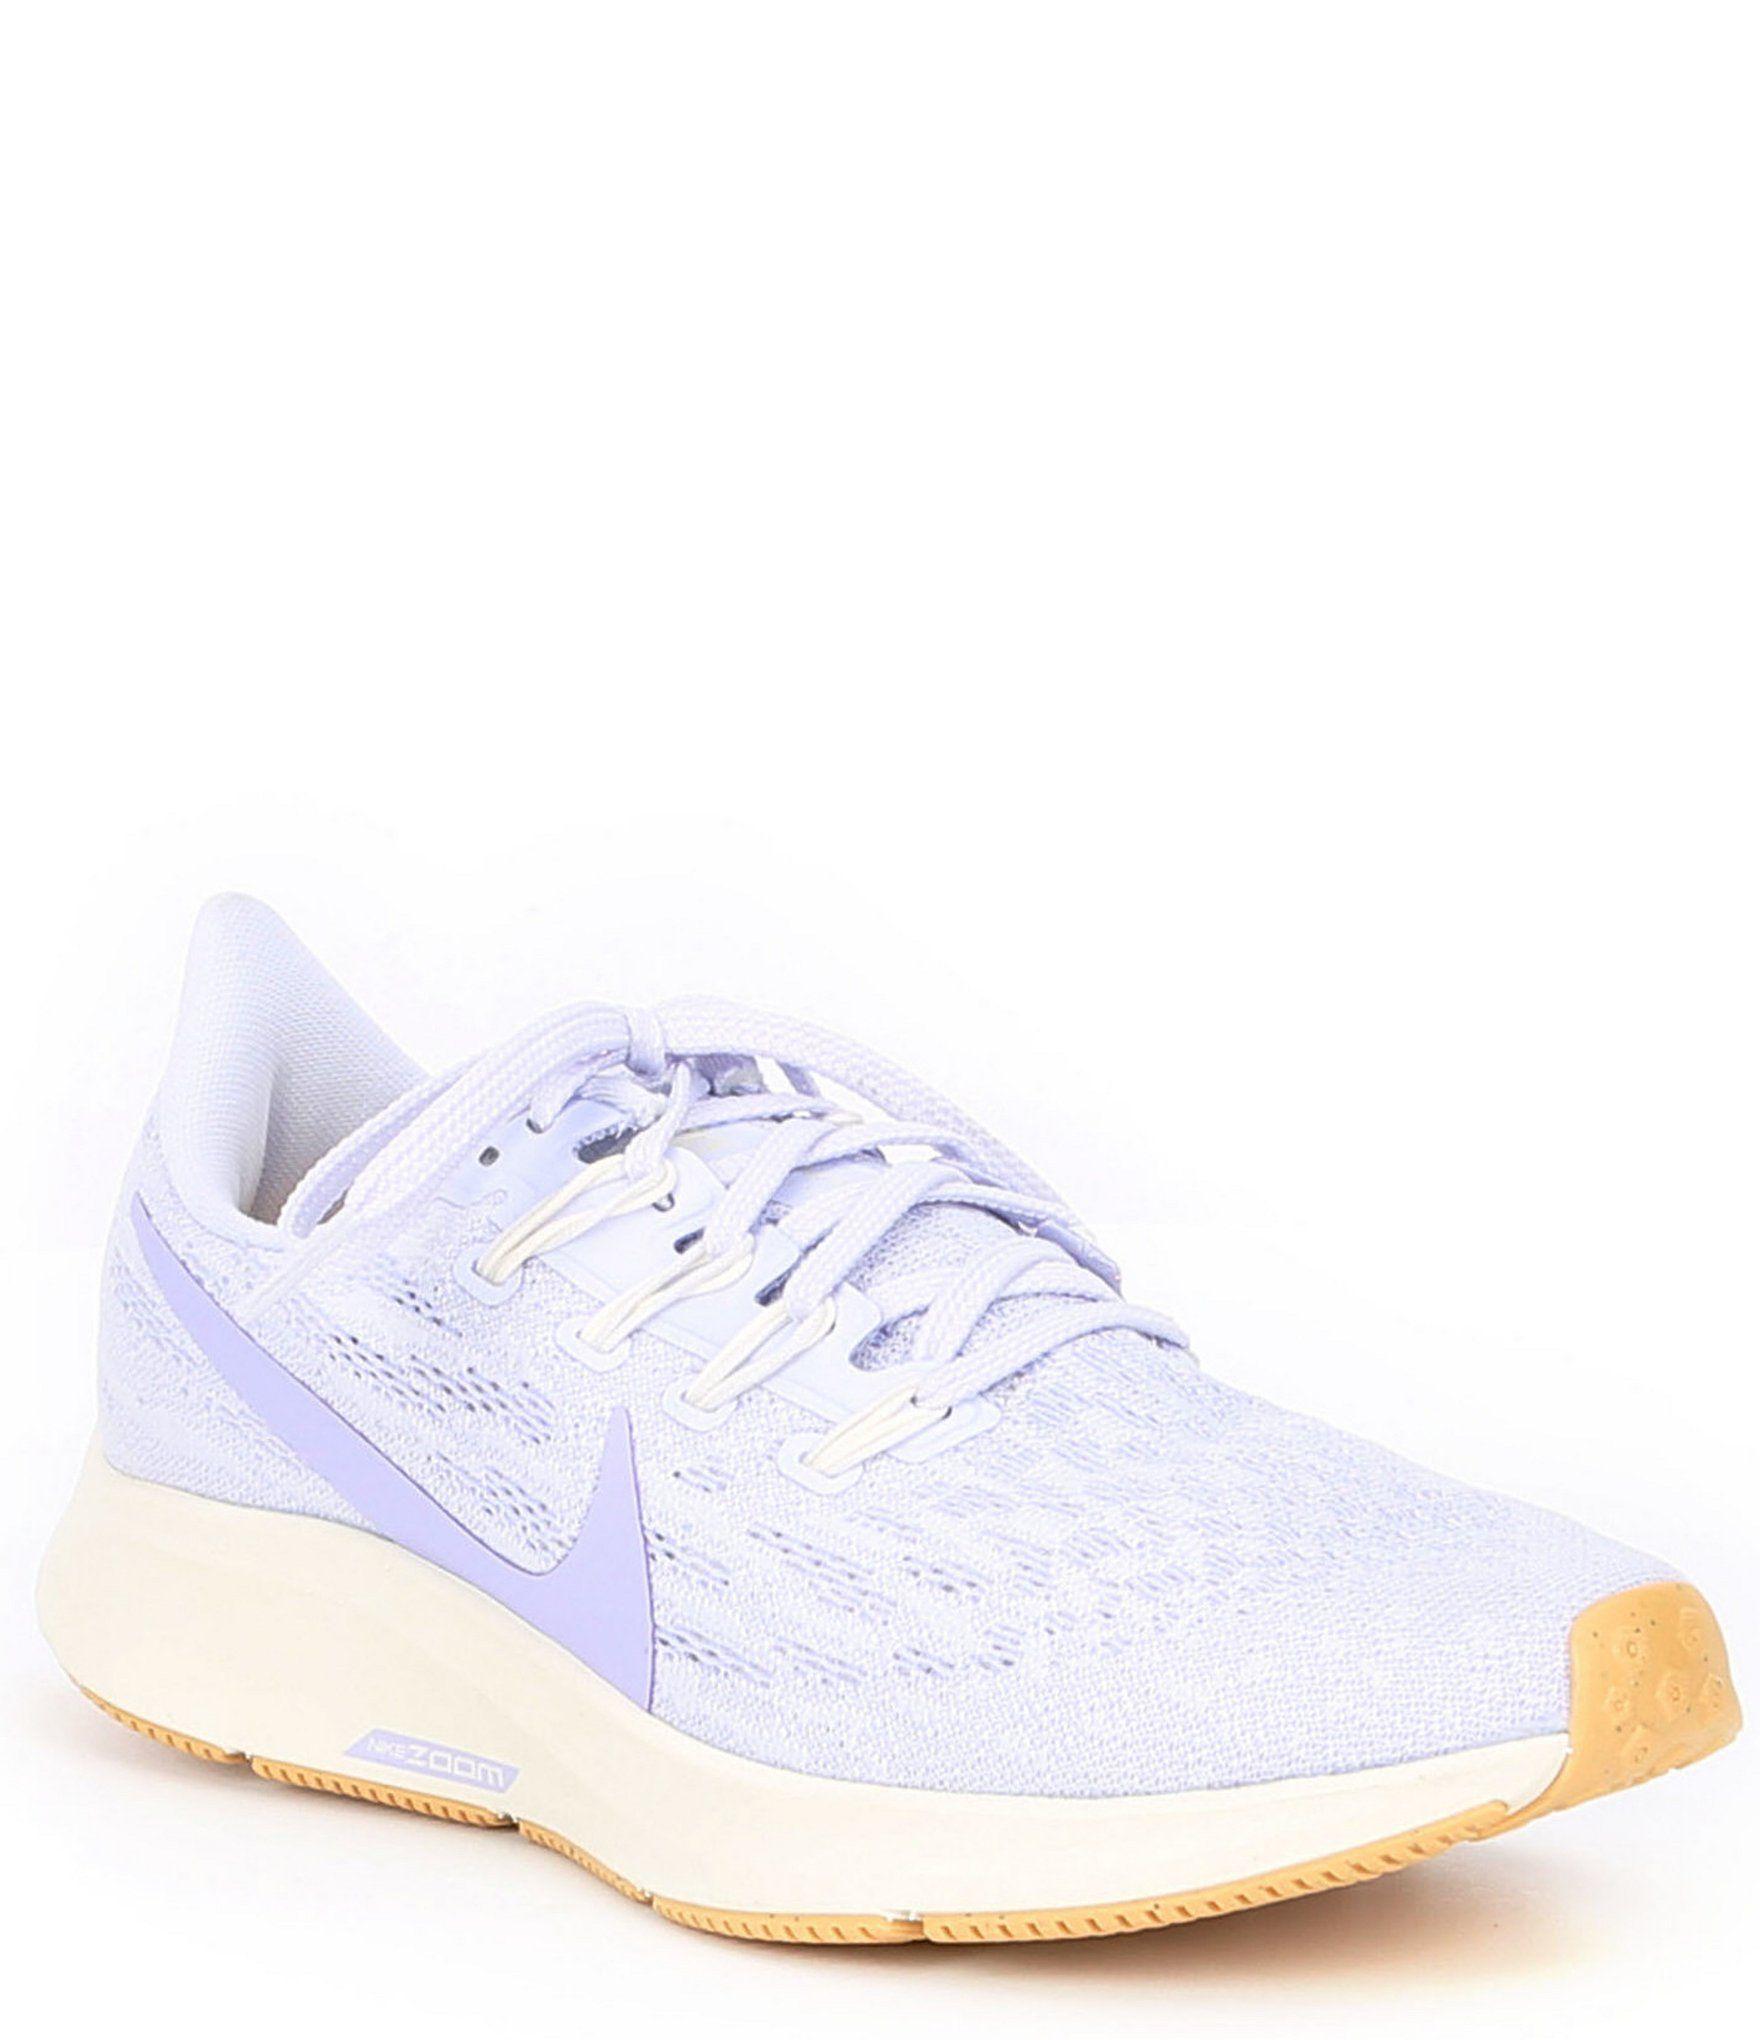 Nike Women's Air Zoom Pegasus 36 Running Shoes Black